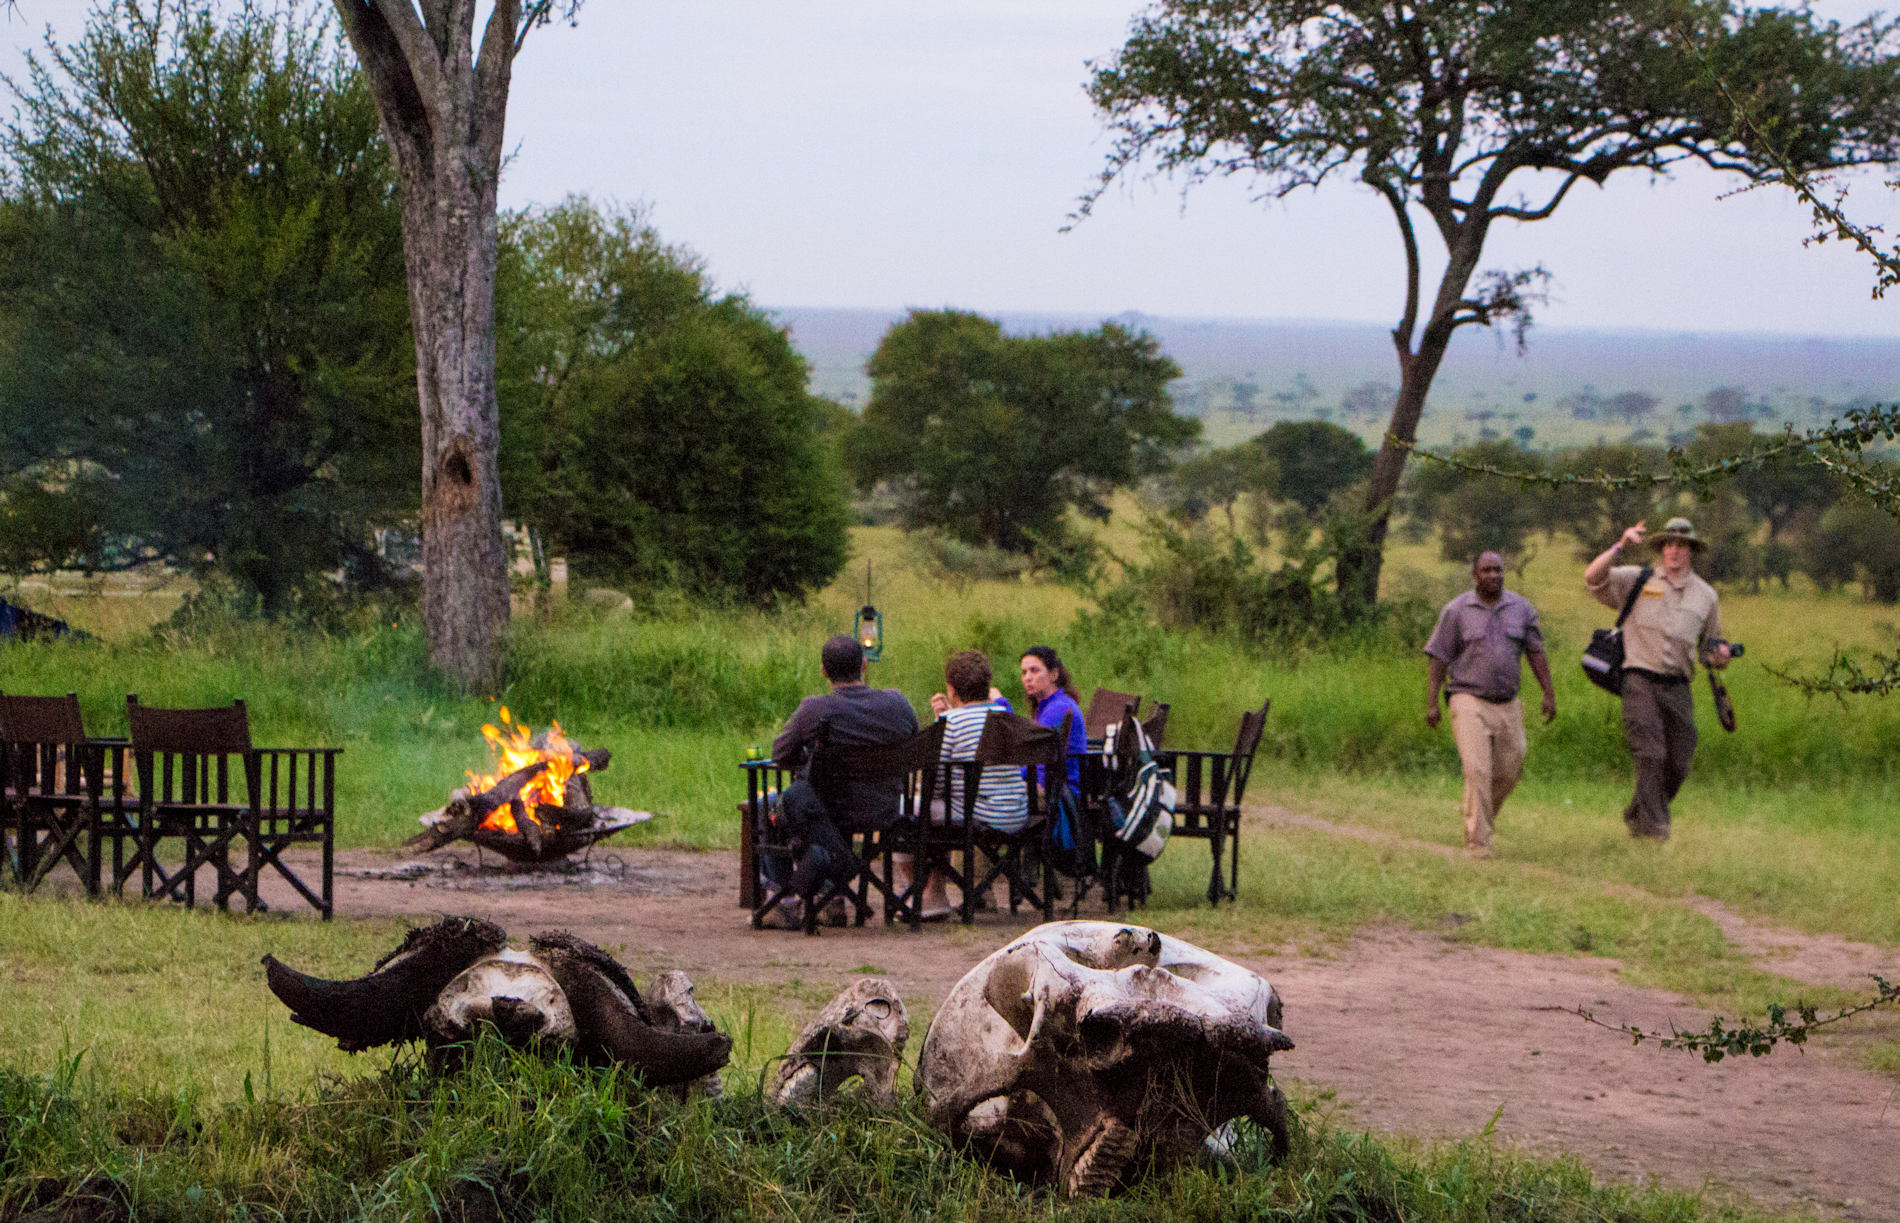 Dunia-Camp Serengeti Tansania